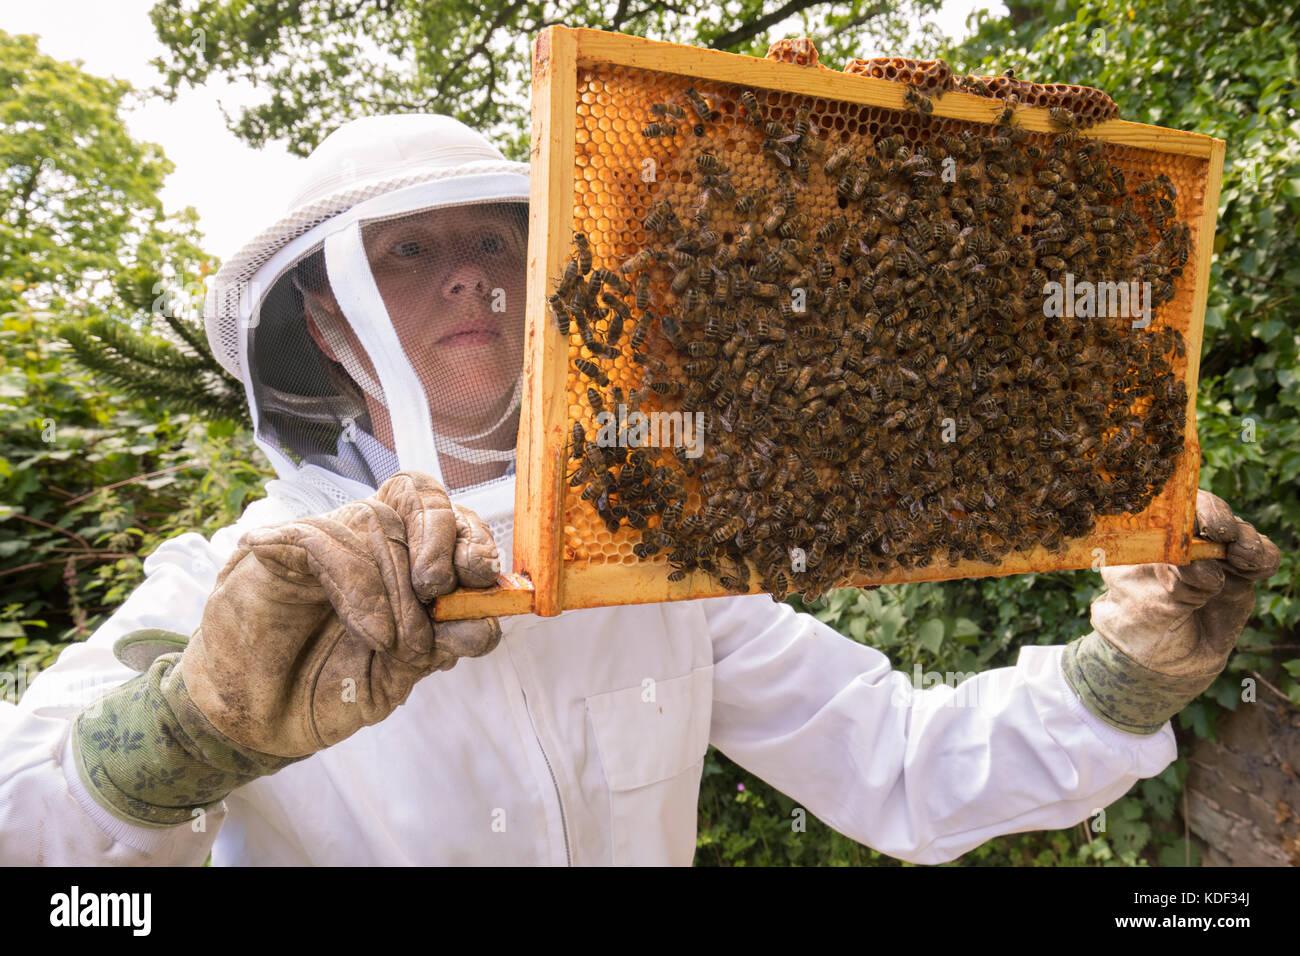 tending a honey bee colony - Stock Image